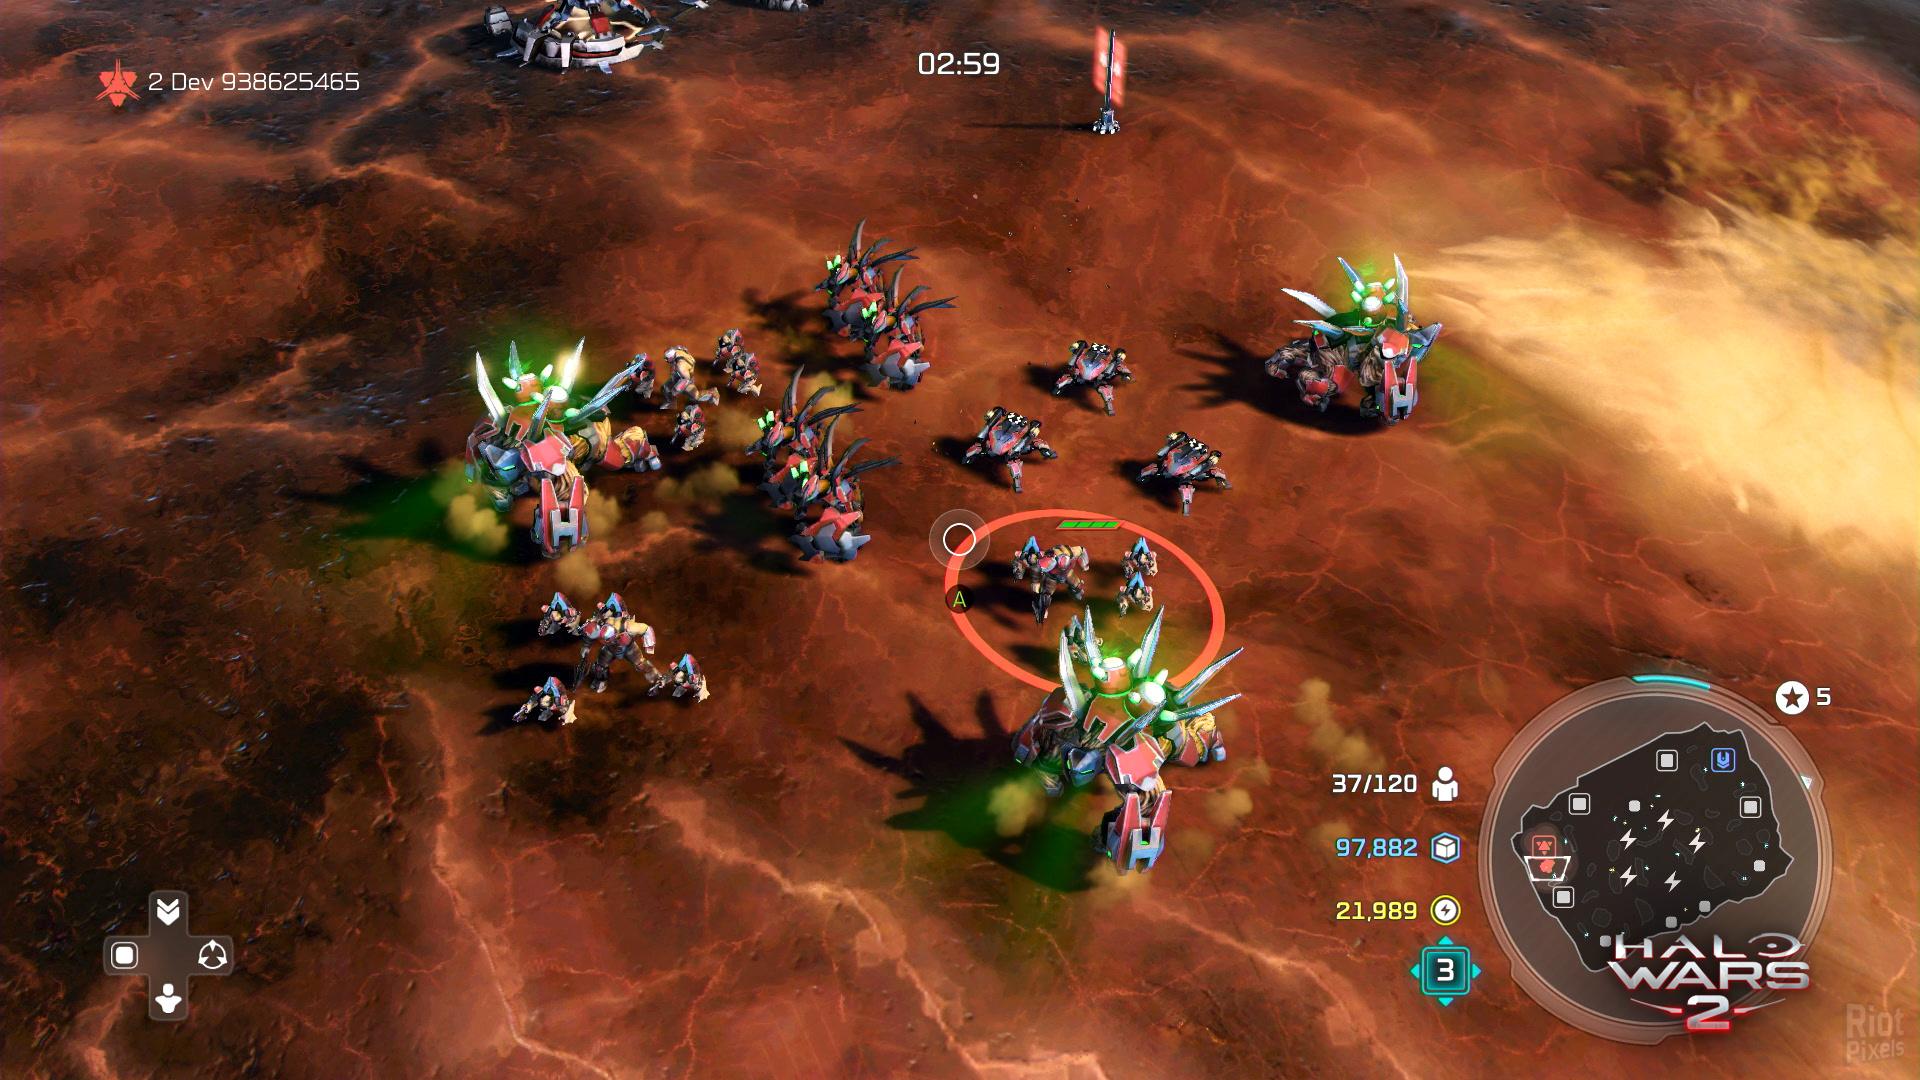 Halo Wars 2 İndir – Full | Oyun İndir Club - Full PC ve